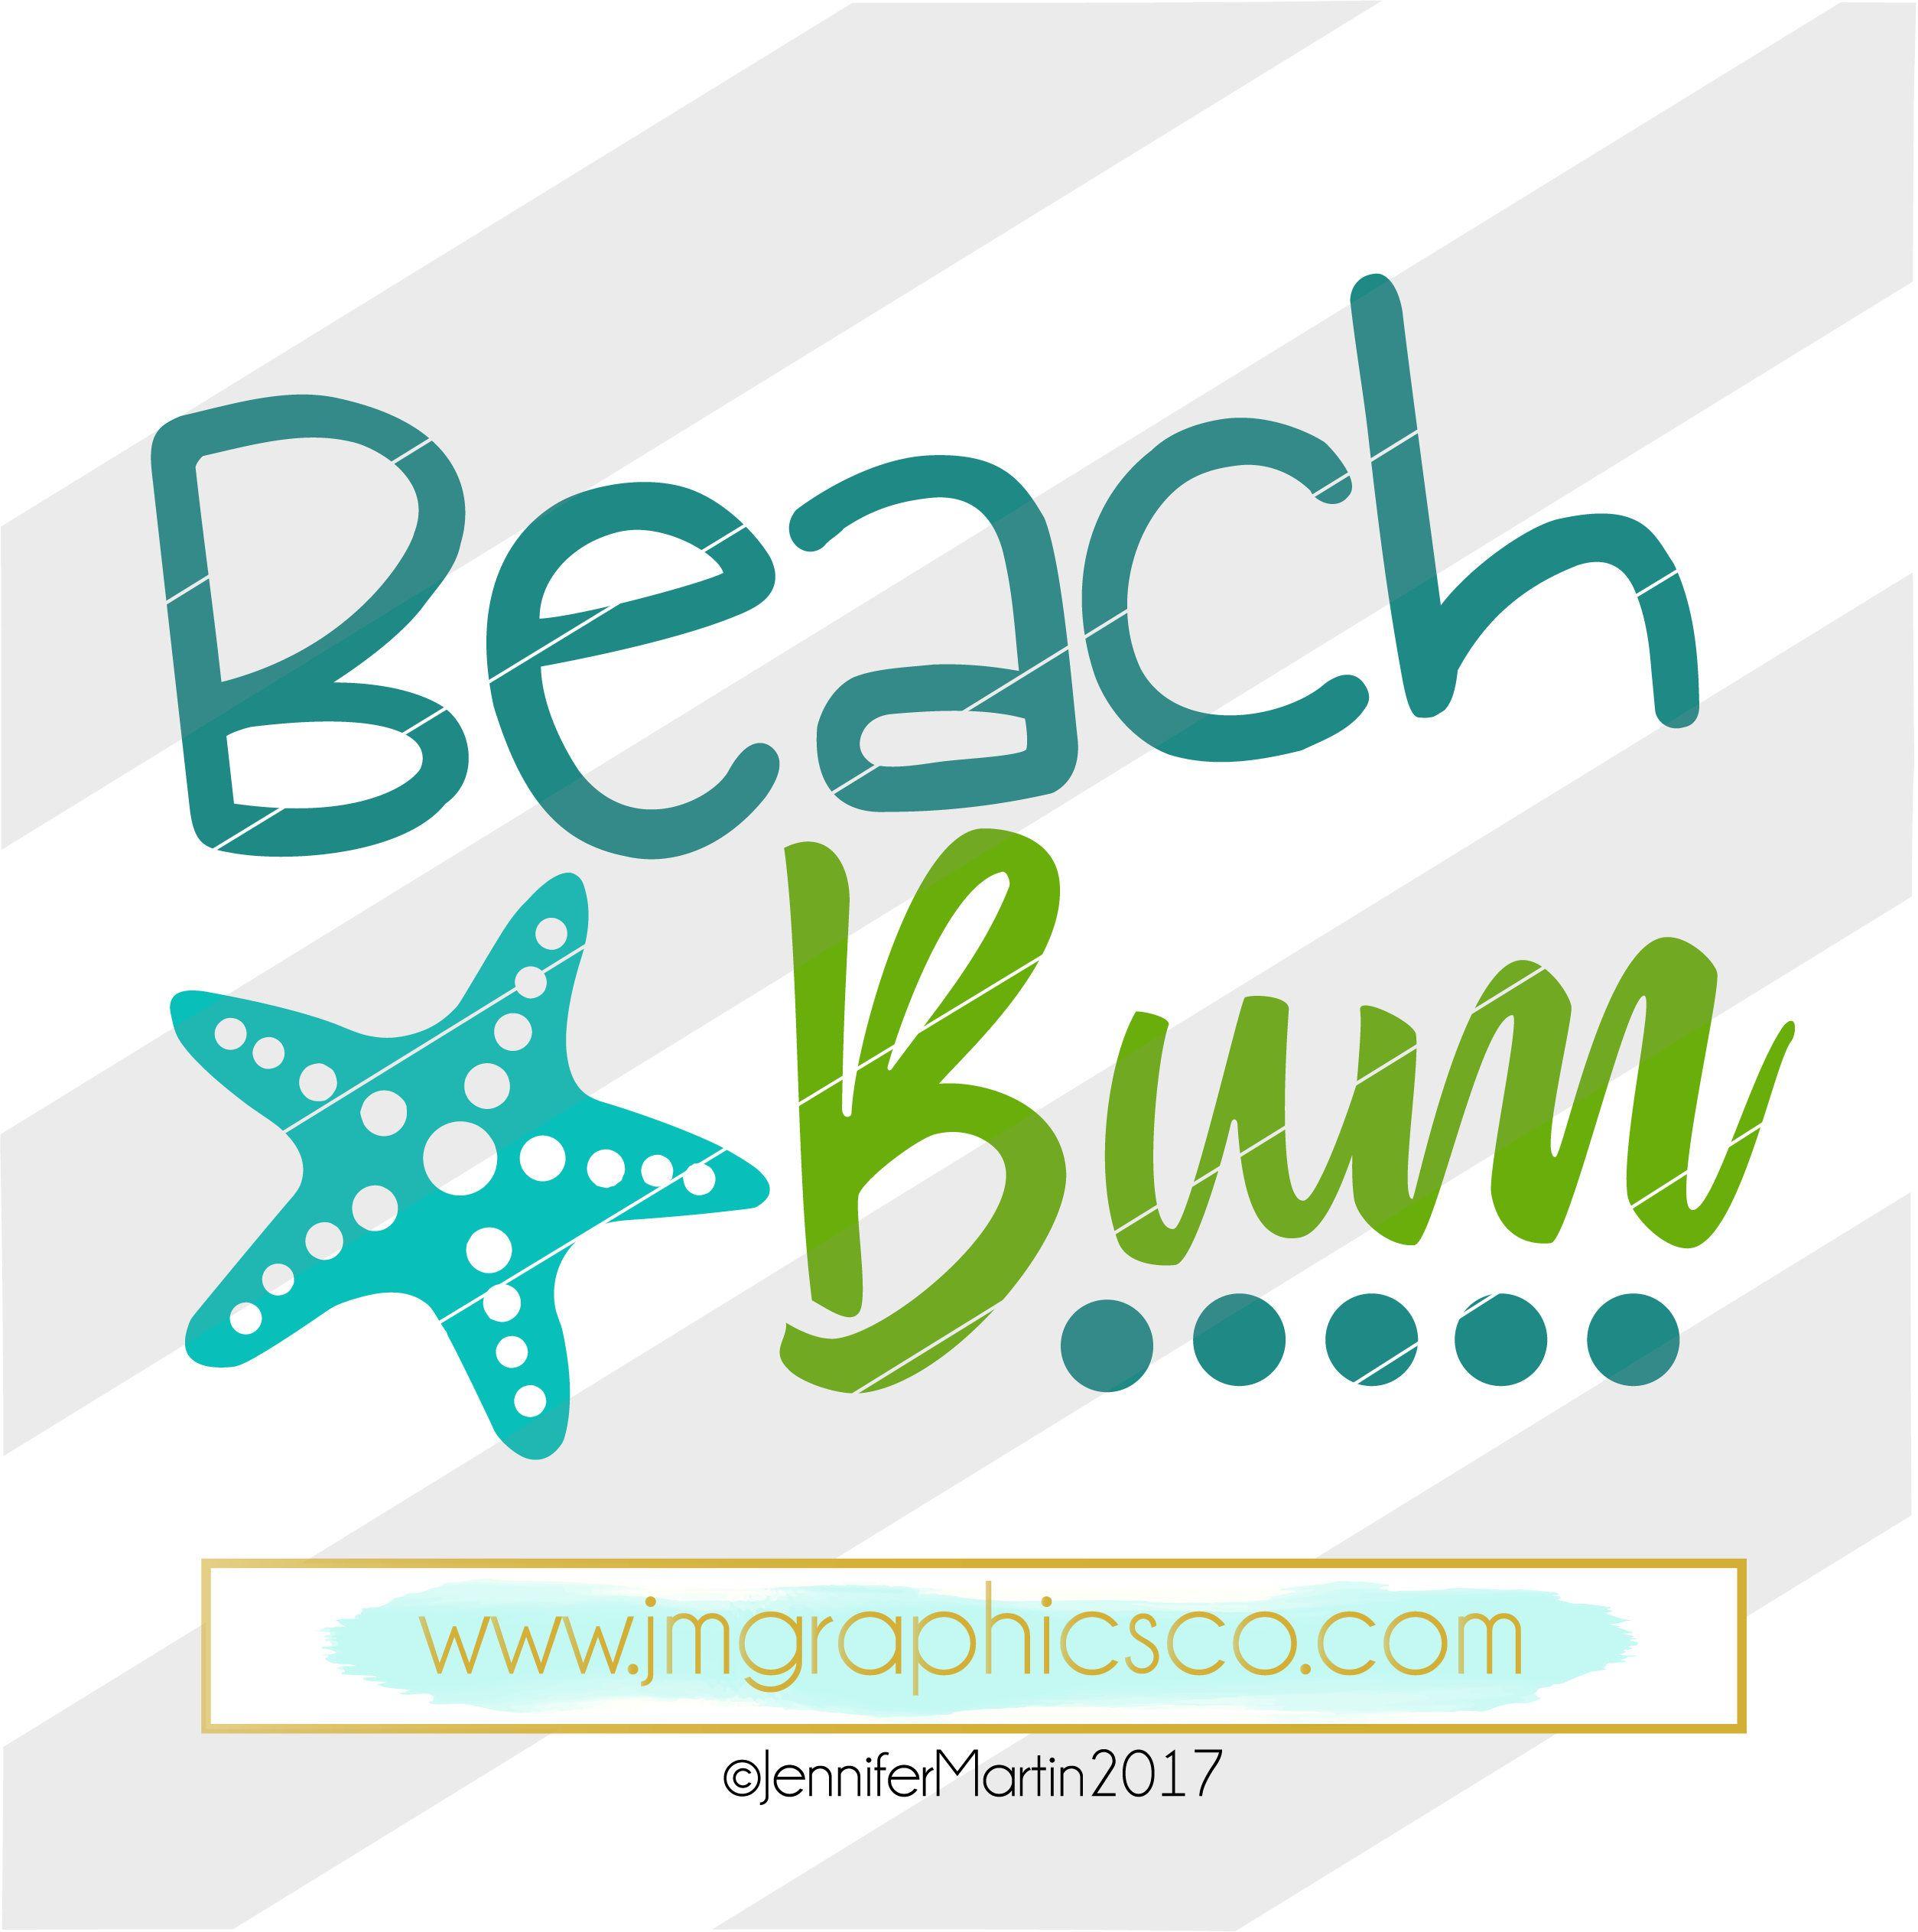 Pin by Krystal fender on cameo 3 | Cricut, Beach bum